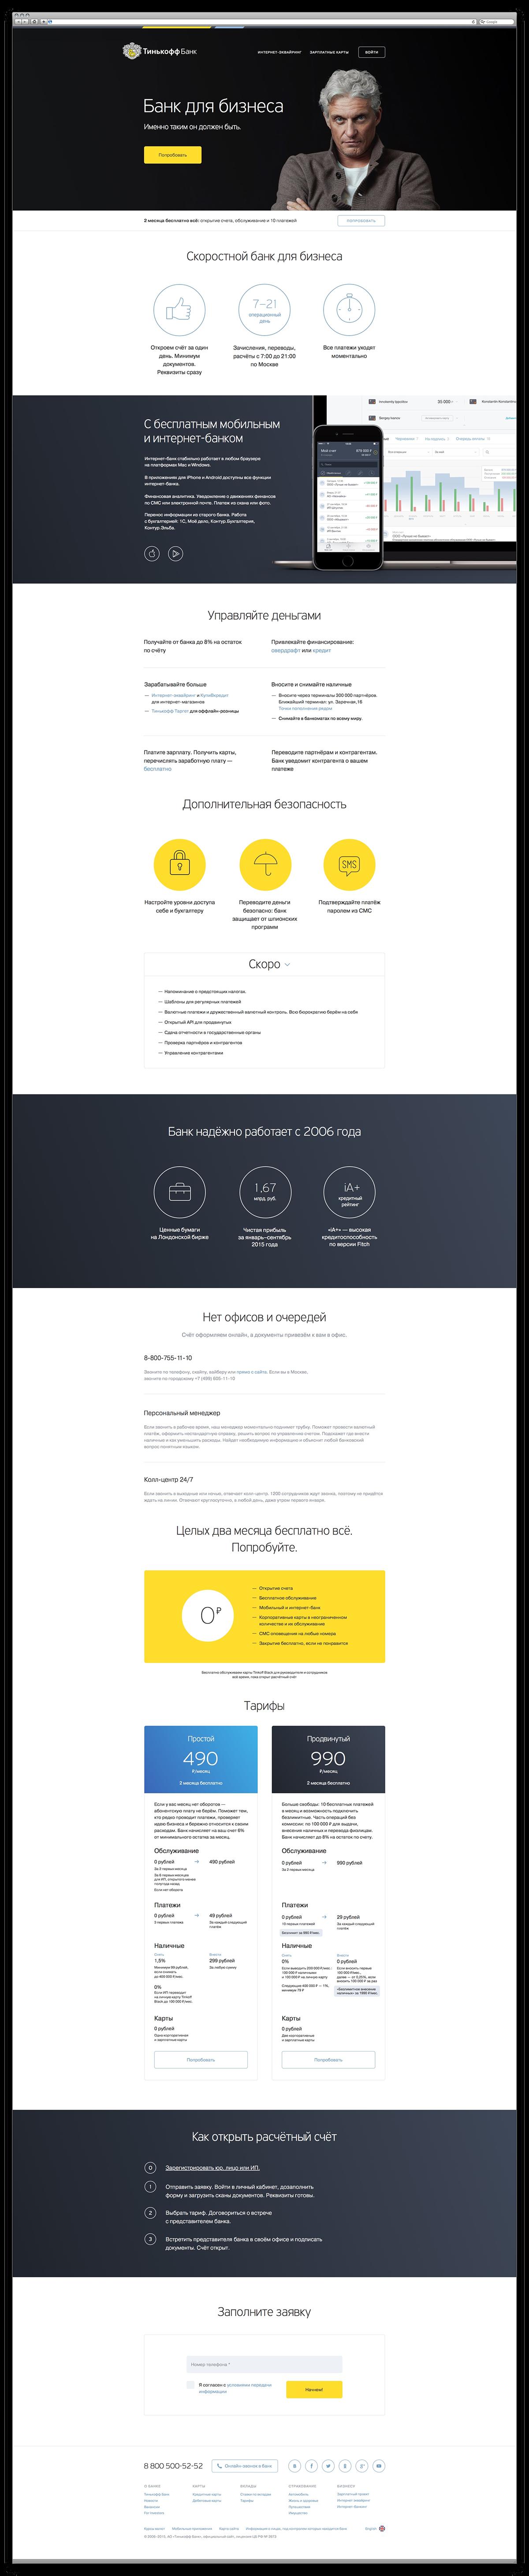 Web copywrite text Buisness Bank